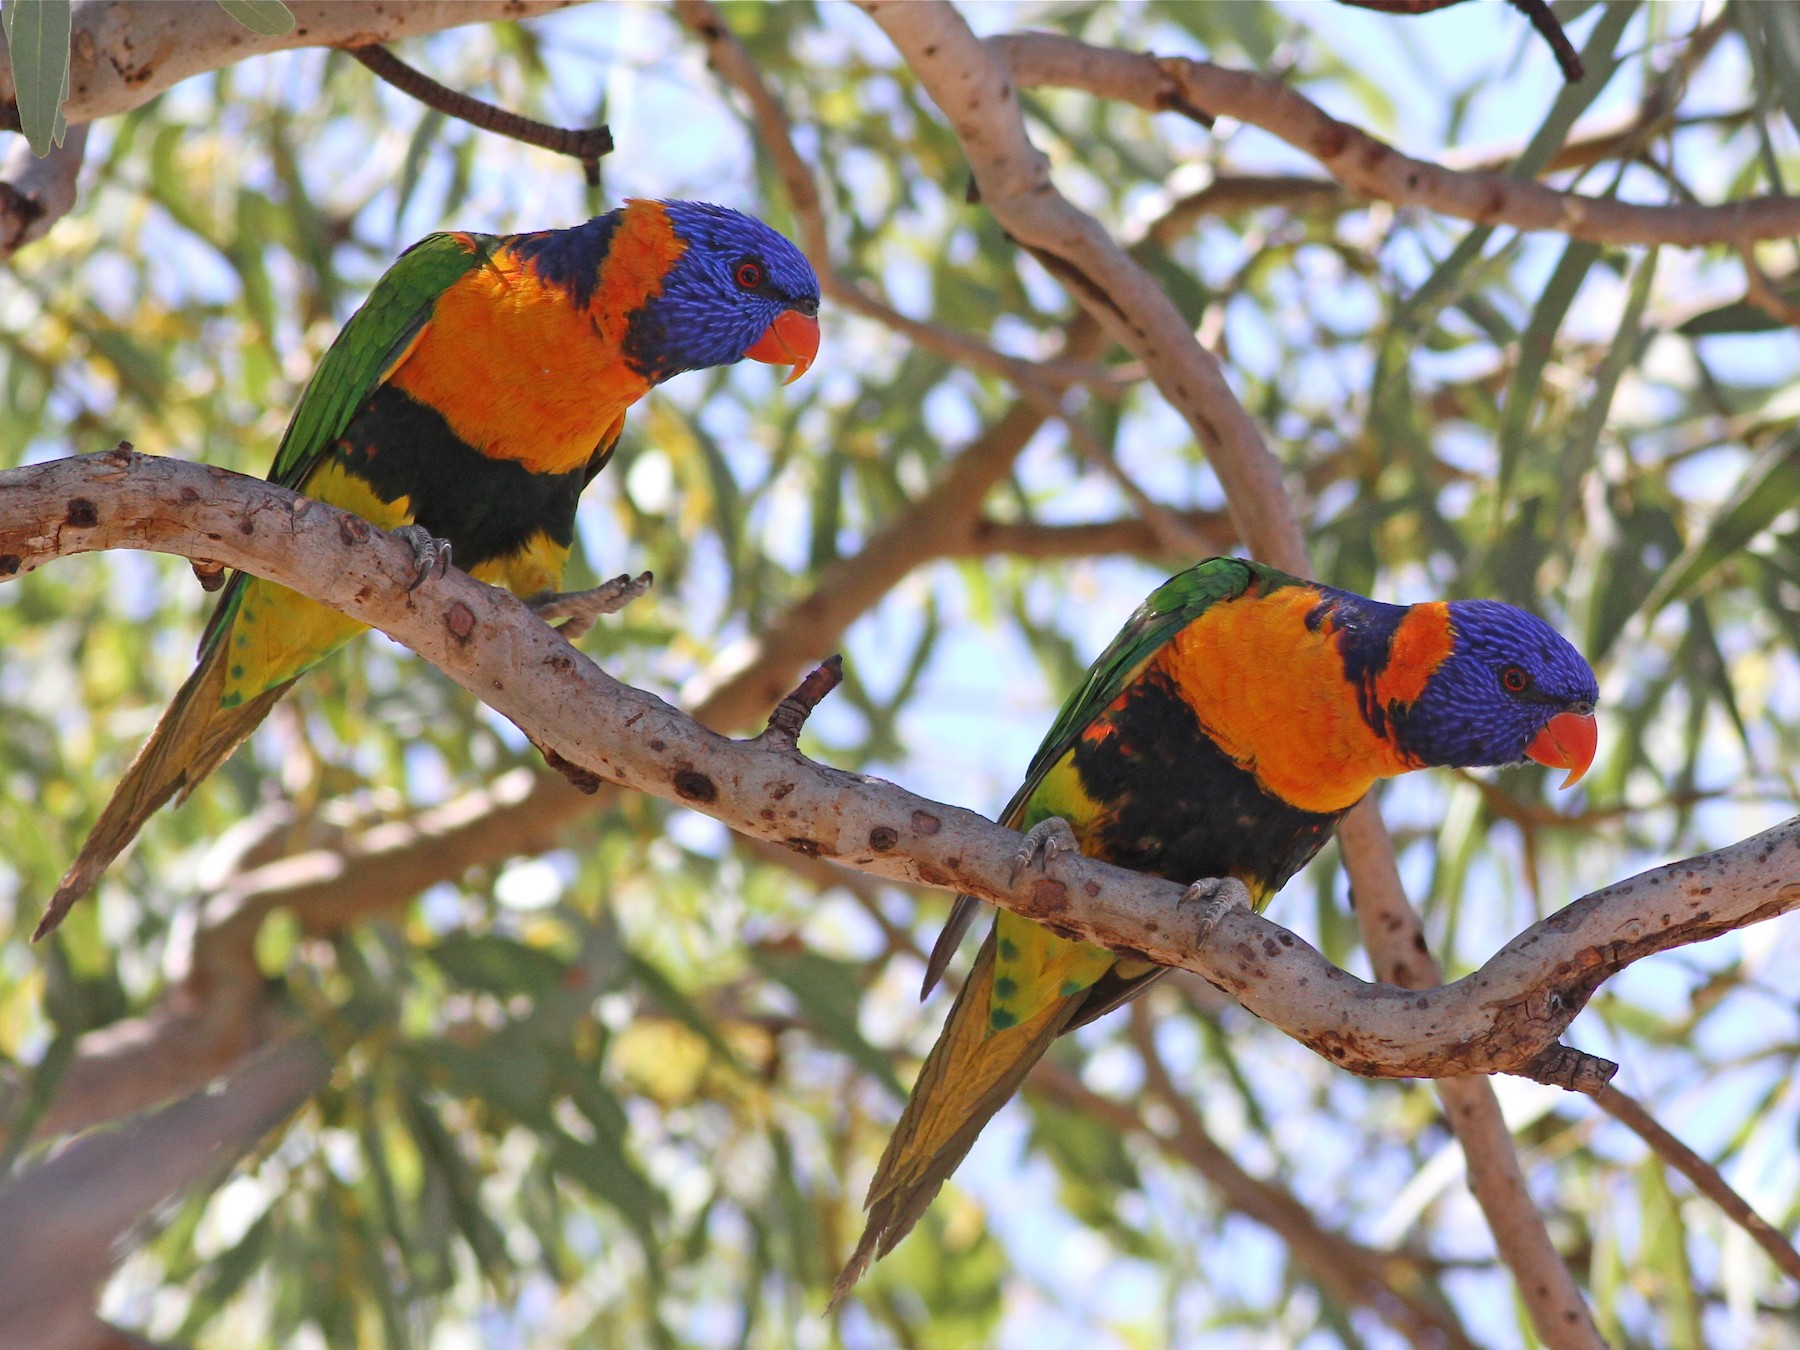 rainbow lorikeet sp. - Chris Wiley